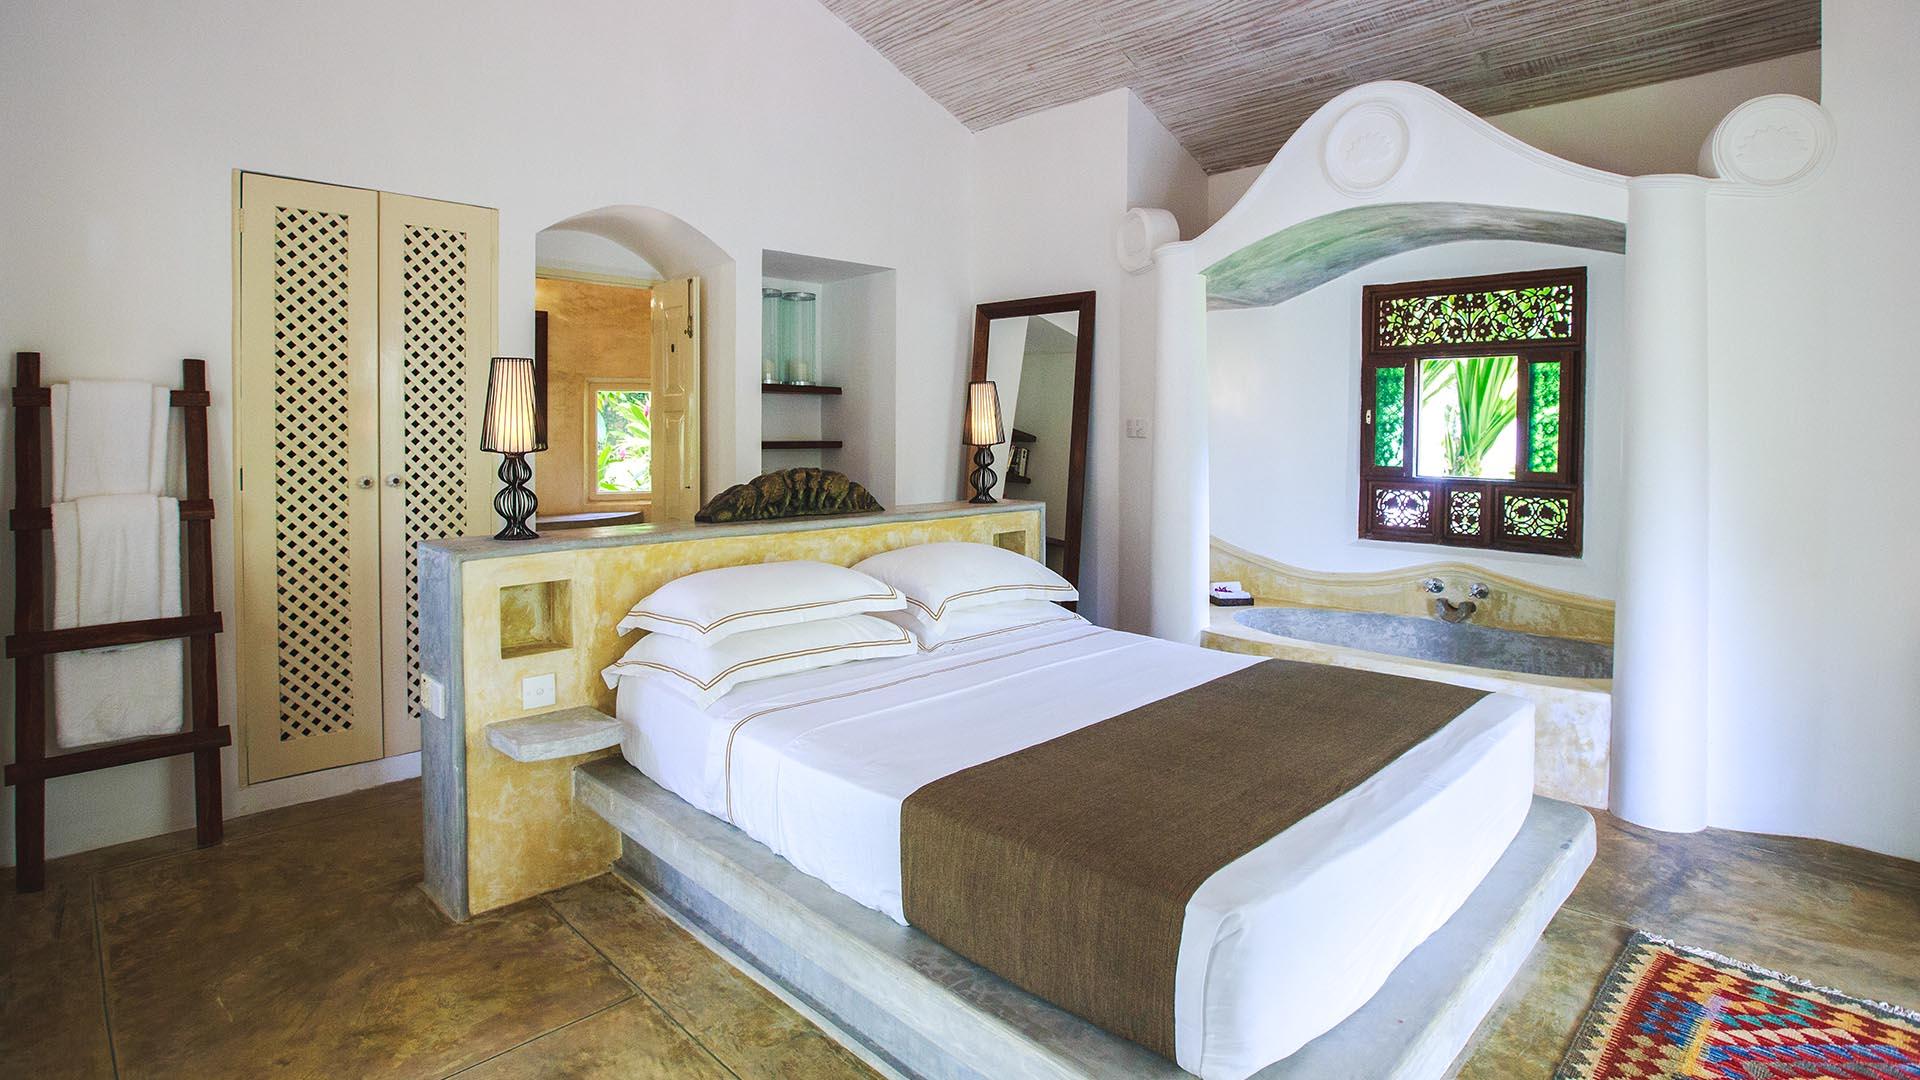 Thalduwa_villas_villa_karmel_honeymoon_suite_thalduwa_villas_villa_karmel copy 2.jpg